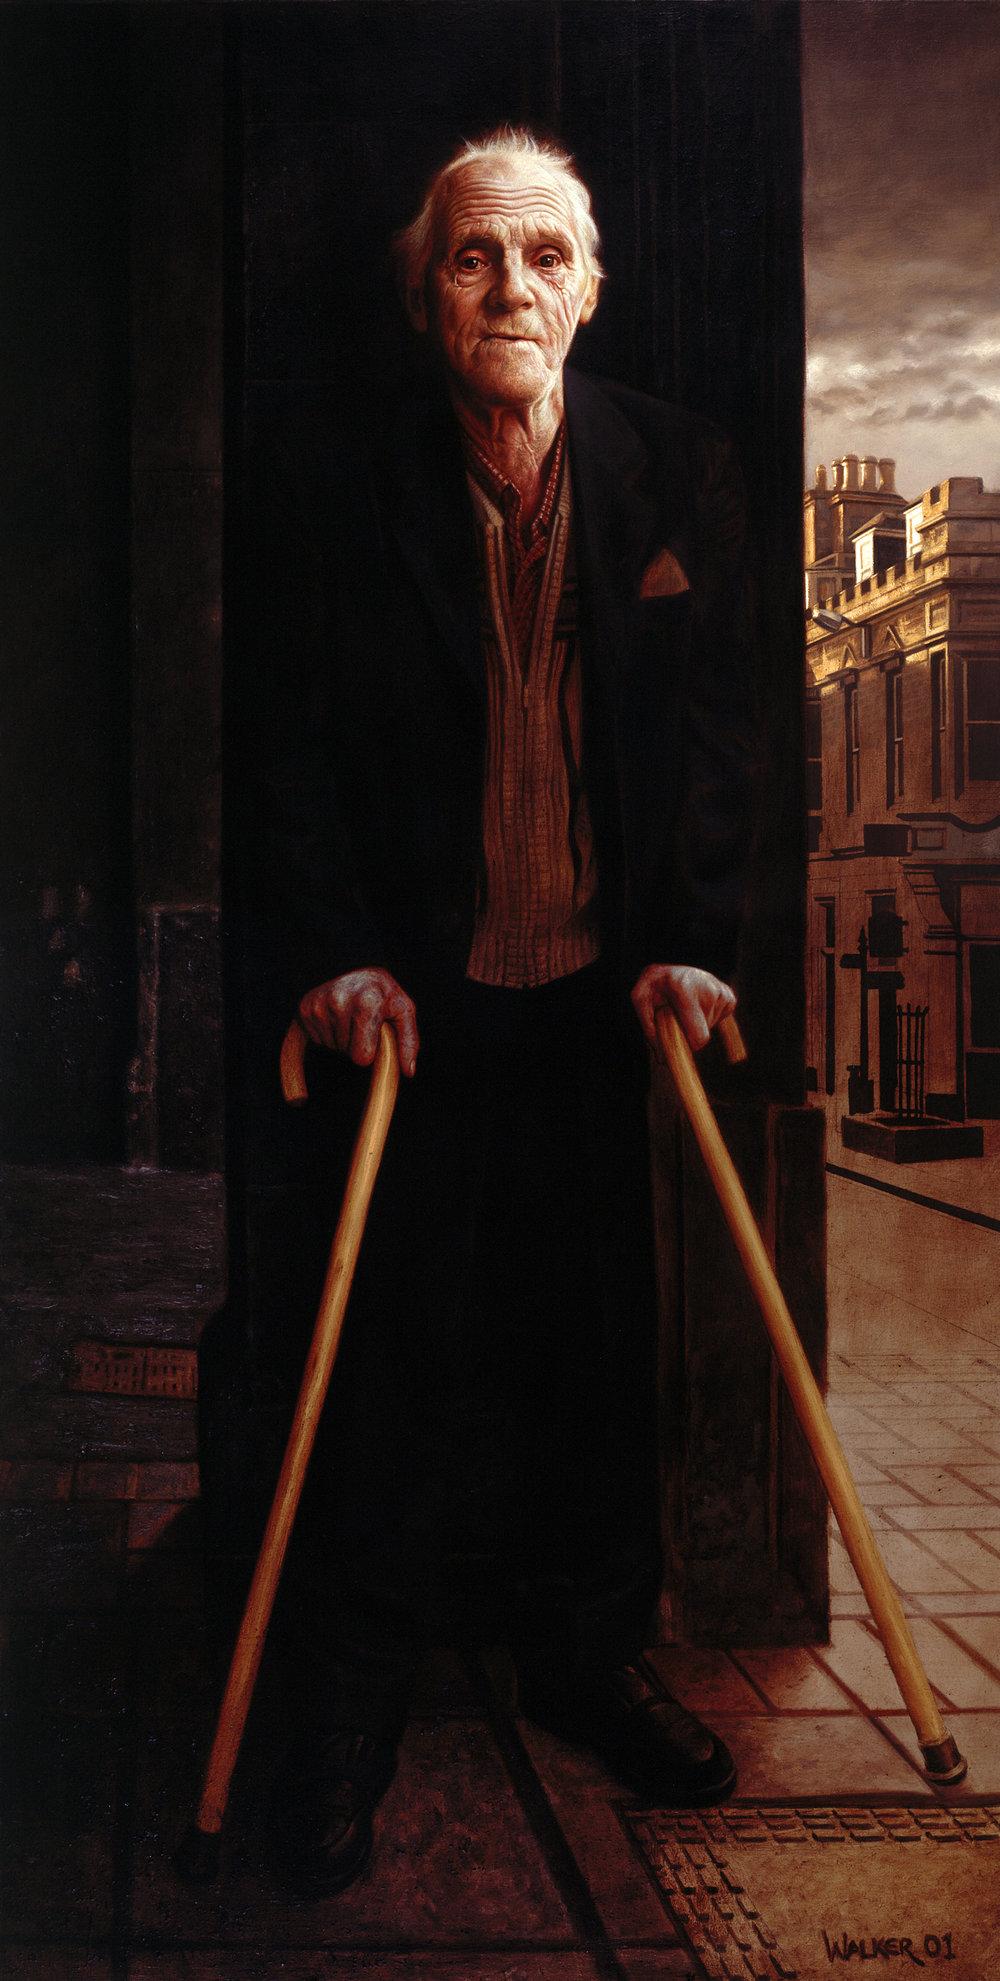 James Clarke. Oil on canvas.